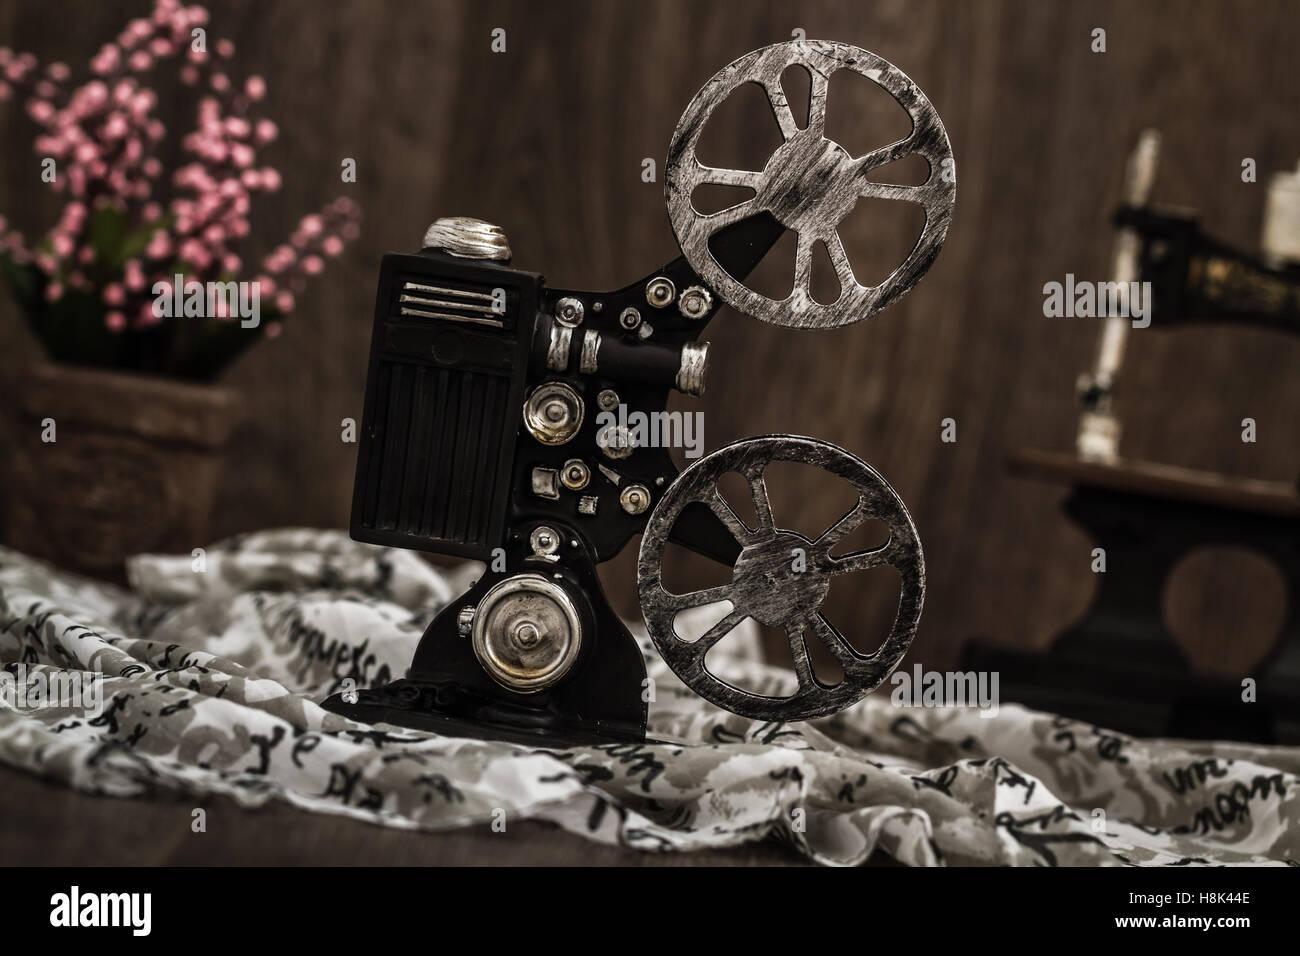 Small nostalgic decorative film camera on brown wooden background - Stock Image